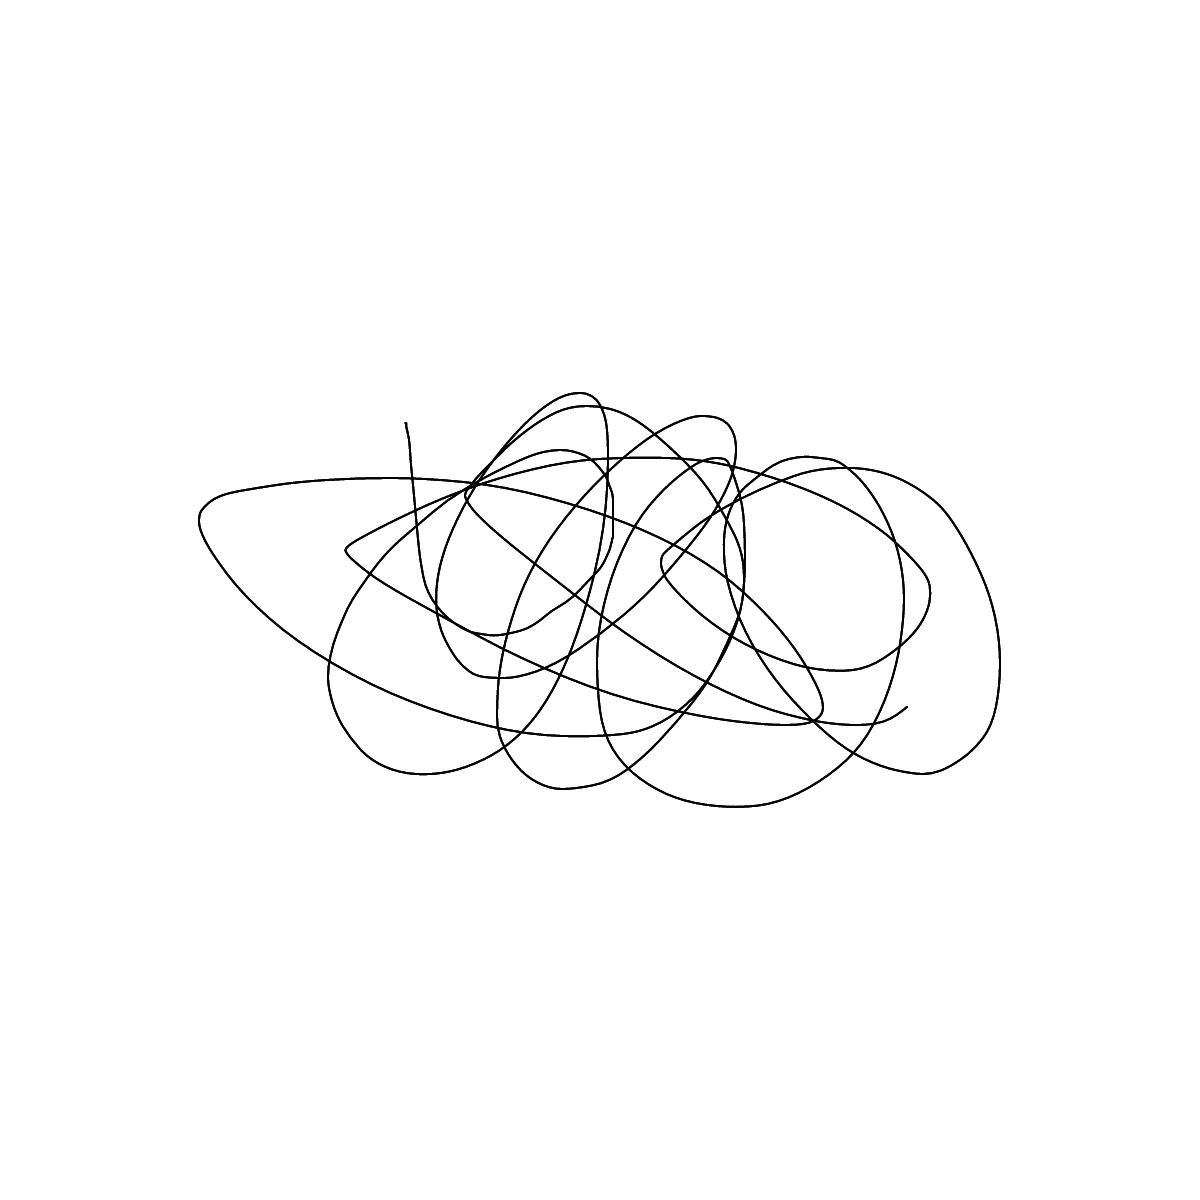 BAAAM drawing#13377 lat:55.4835243225097660lng: 12.5271587371826170